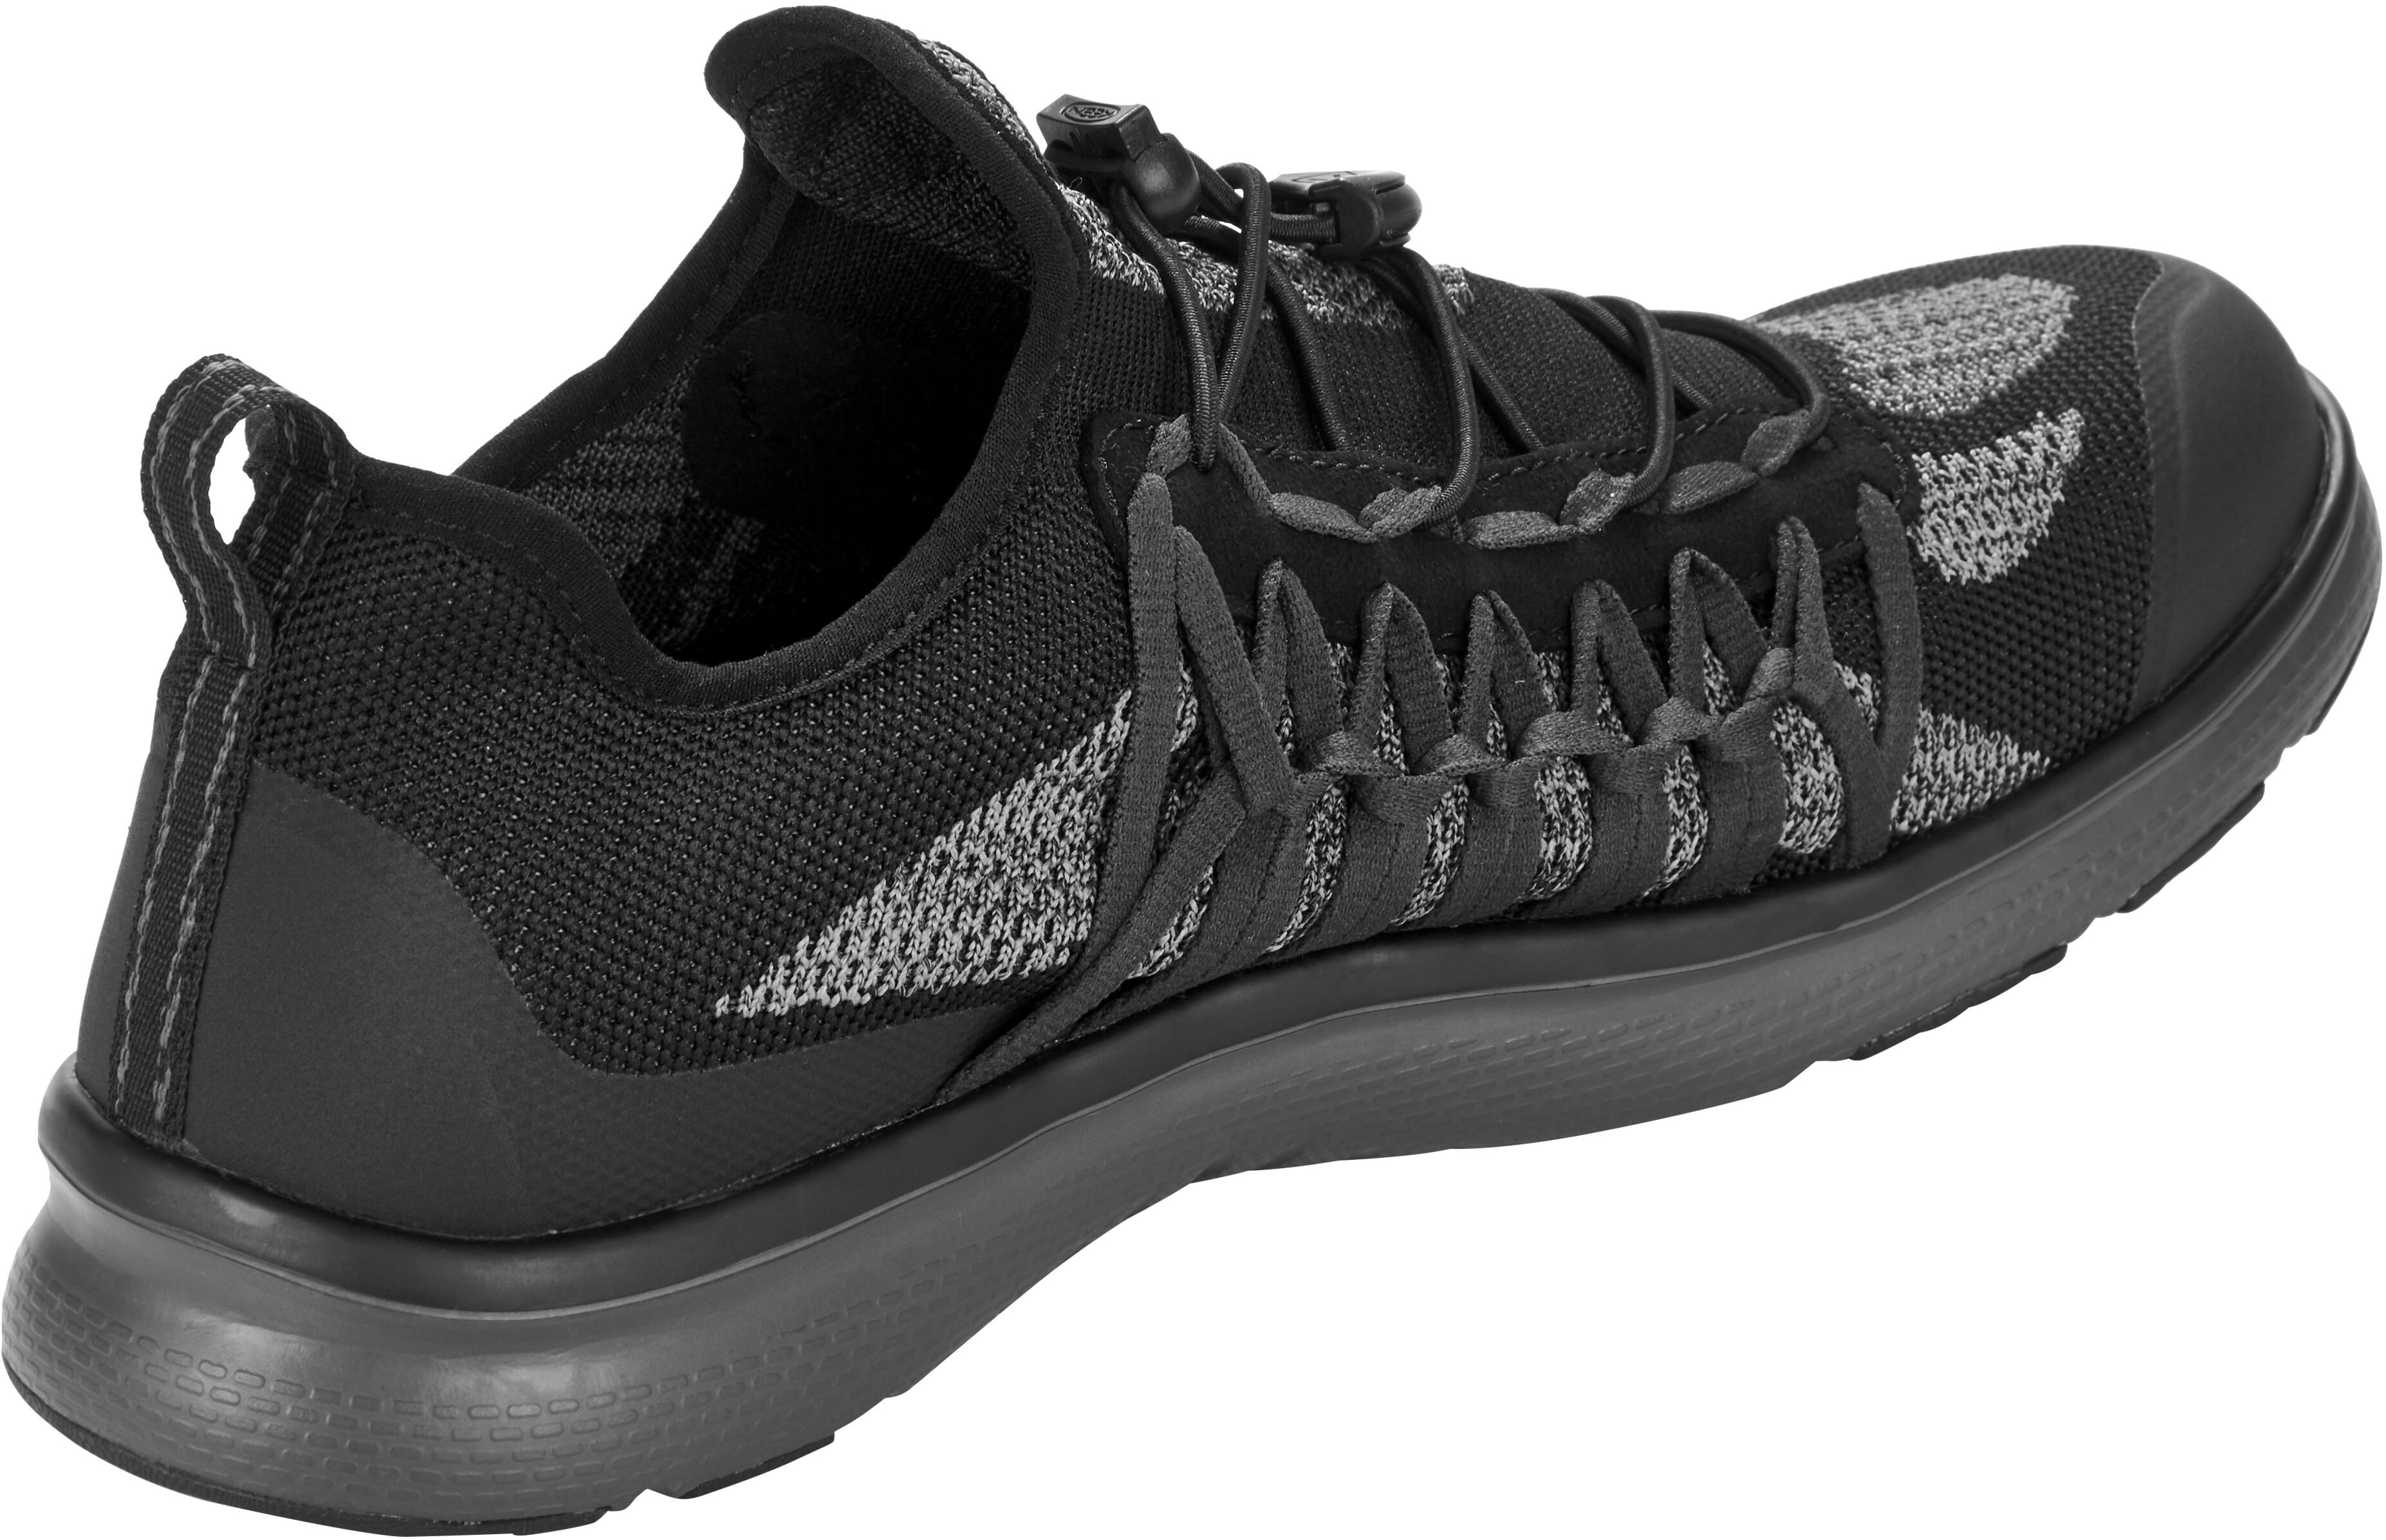 0e4454ec263f keen uneek exo Keen Uneek Exo Shoes Men grey black at Addnature.